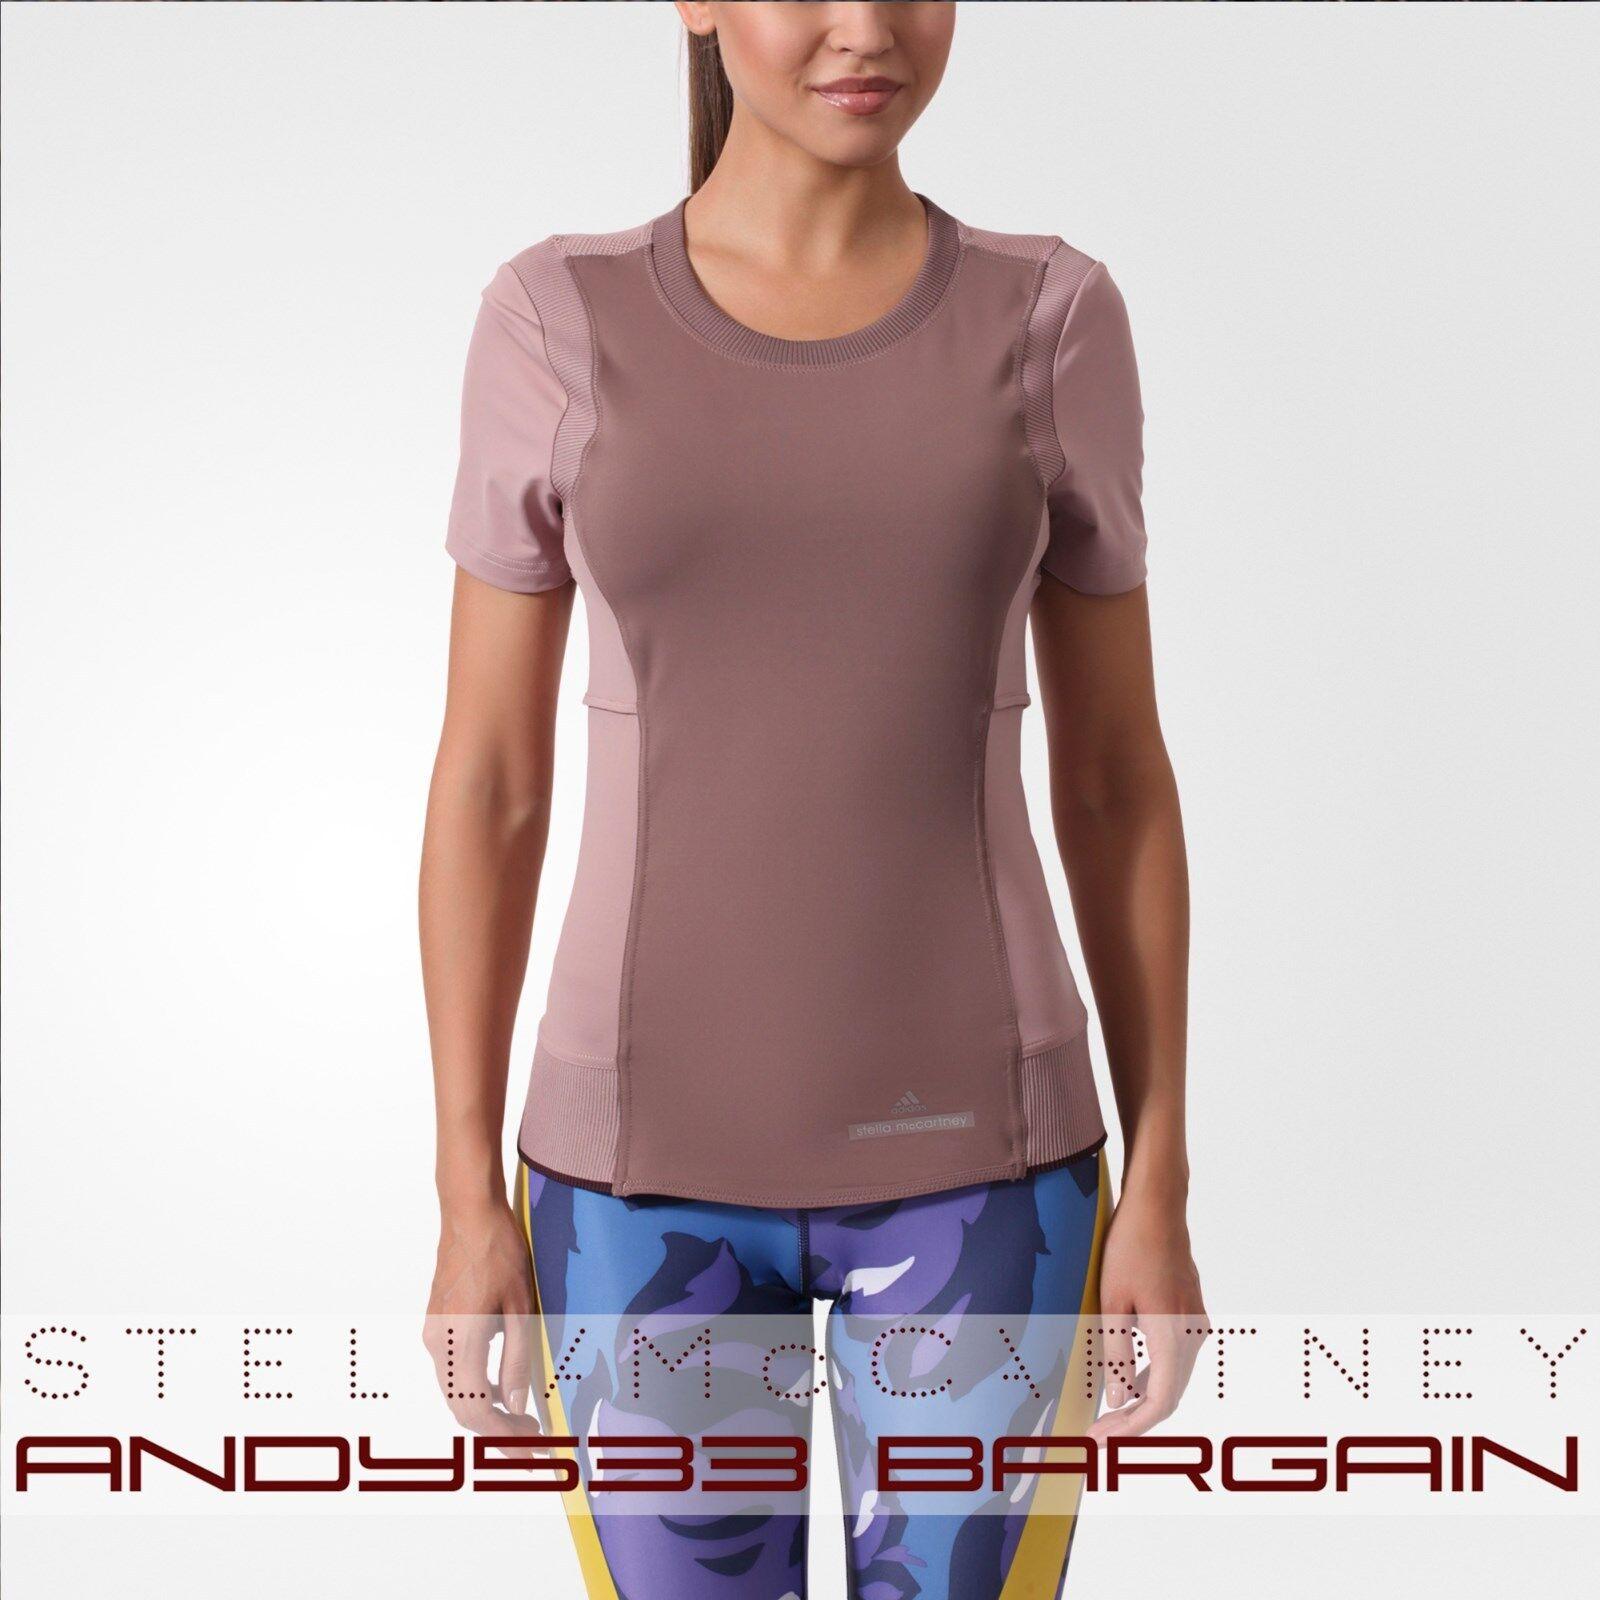 adidas Stella McCartney ΓυναικΡίΡς Ξ΅Ο€ΞΉΞ΄ΟŒΟƒΞ΅ΞΉΟ' ΕΕ ClimaliteΒ� UPF 50+ Sport M